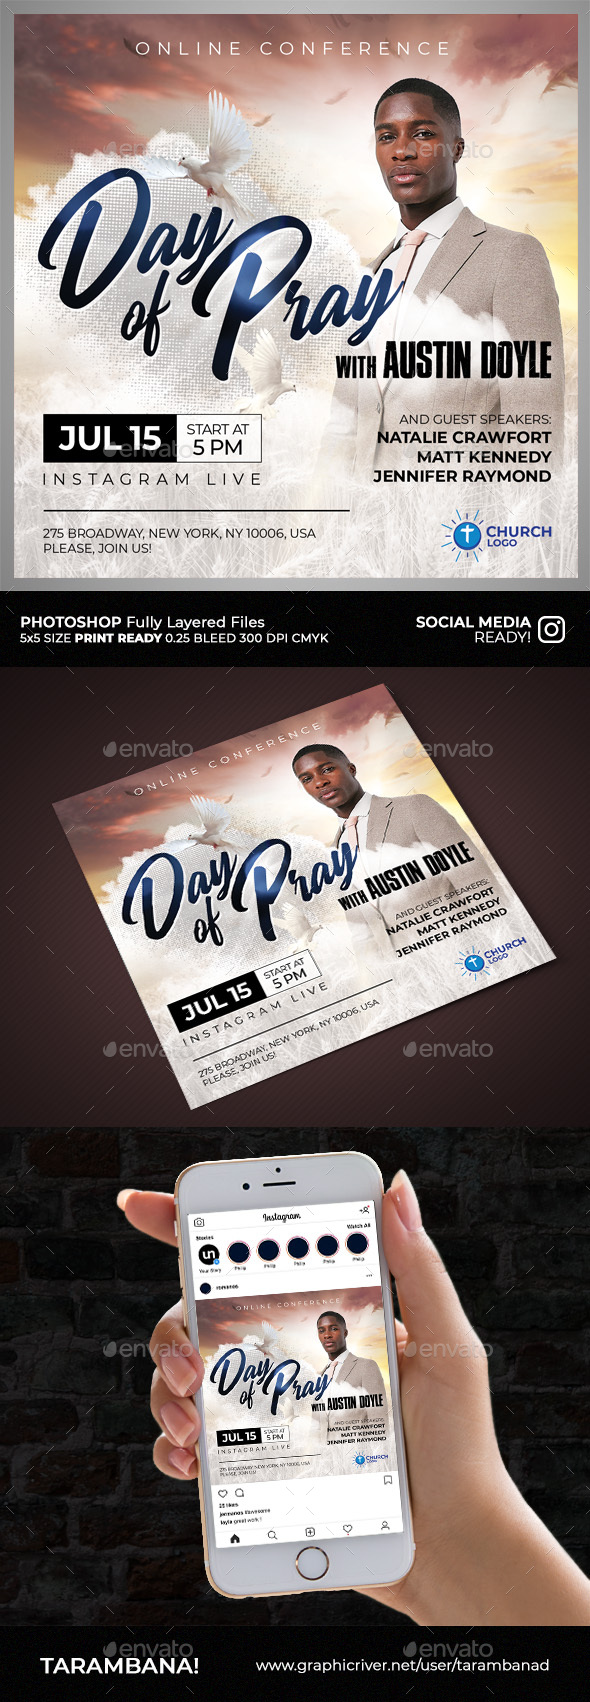 Day of Pray Church Flyer & Social Media Template